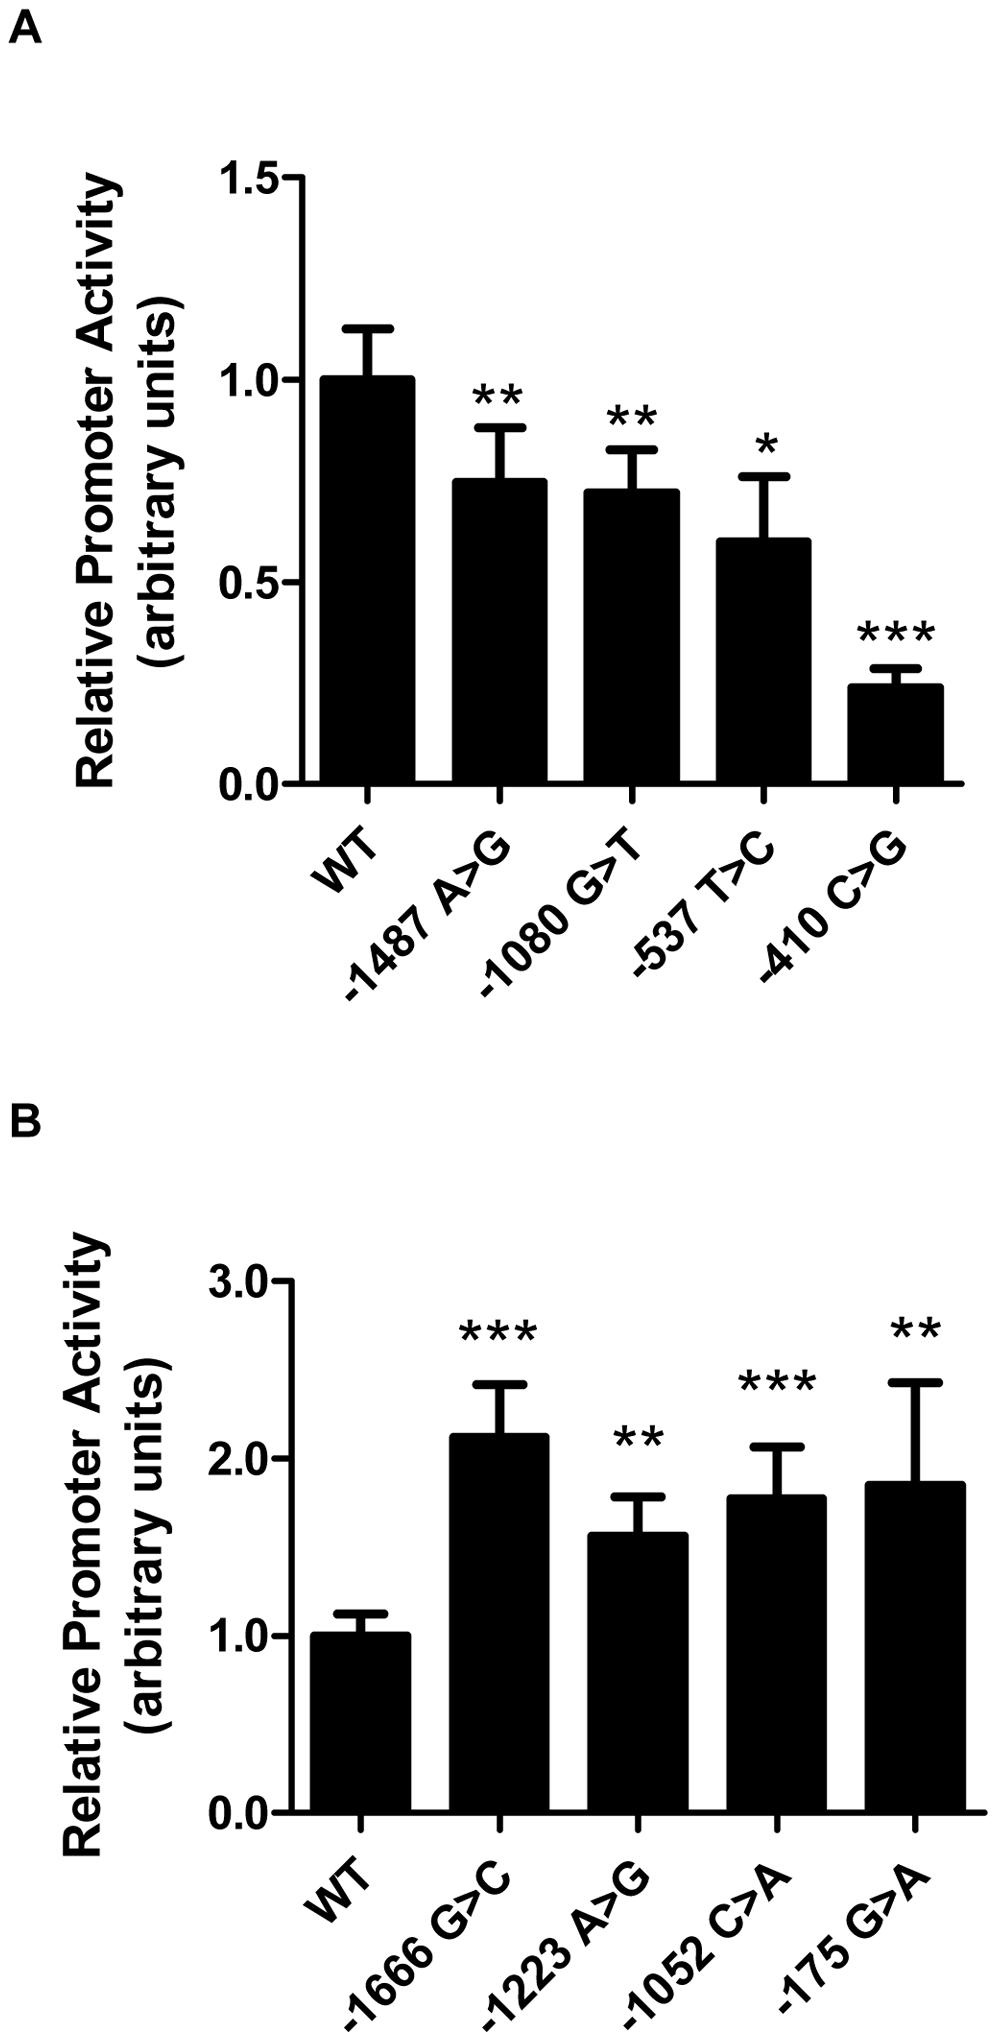 Rare <i>LIPG</i> regulatory variants modulate transcriptional activity <i>in vitro</i>.